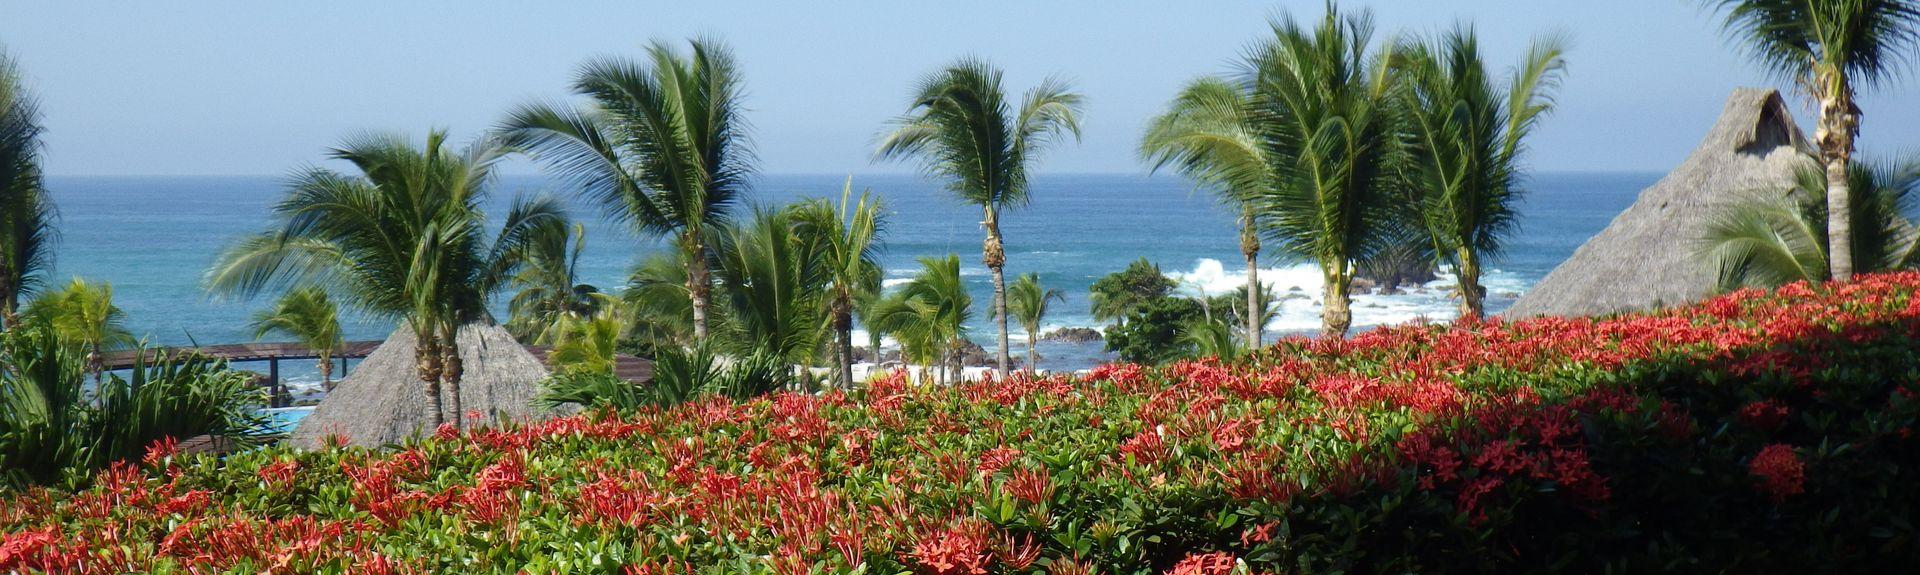 North End, Sayulita, Nay., Μεξικό